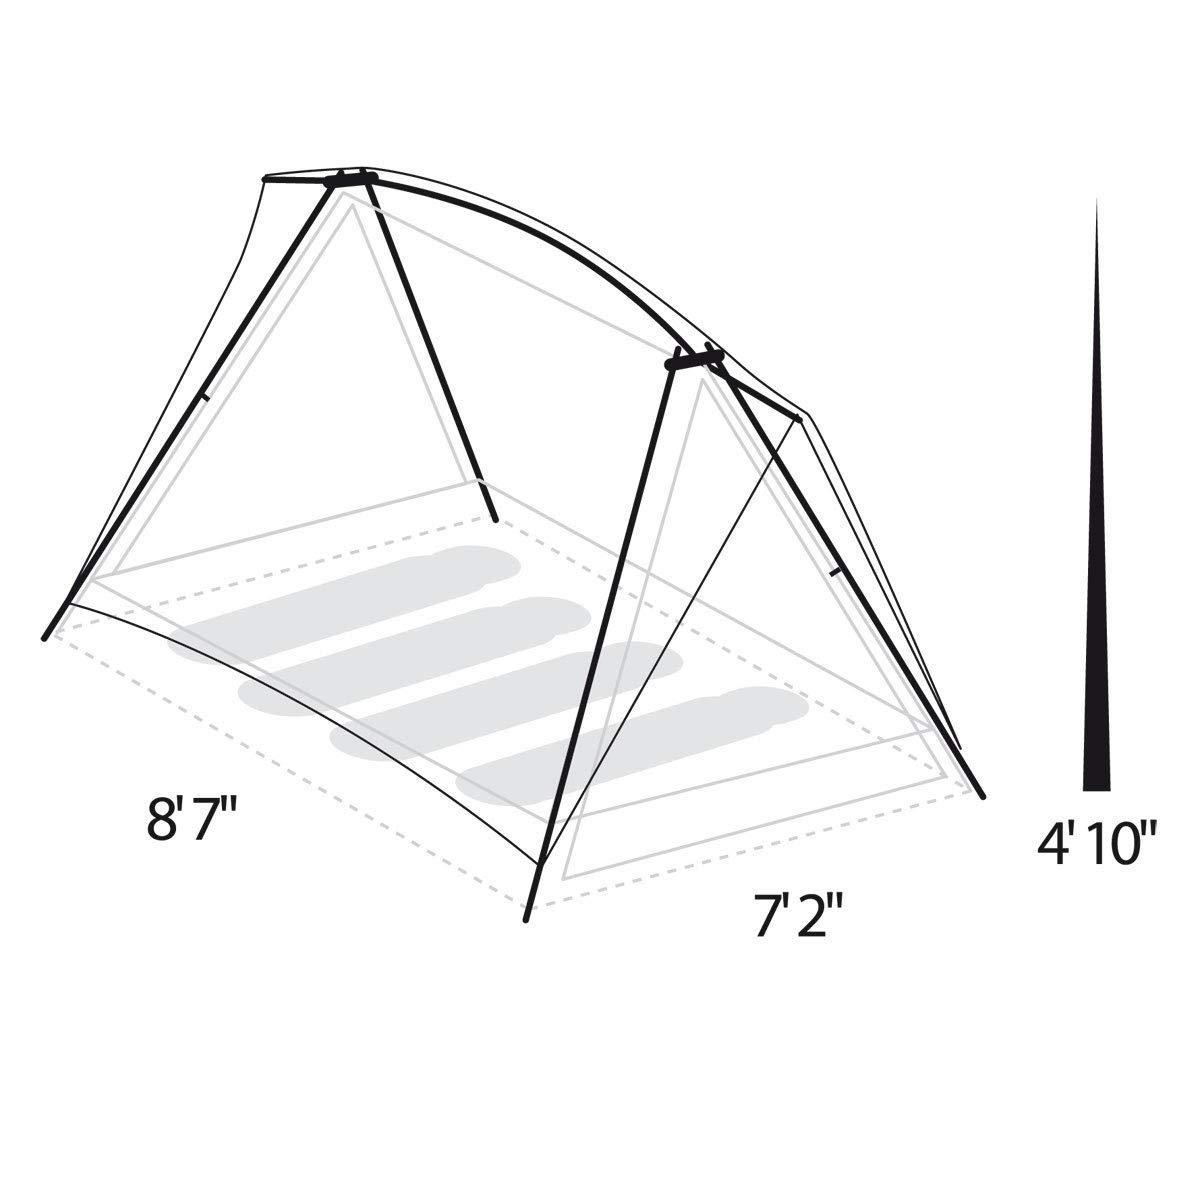 Timberline Backpacking Tent Eureka